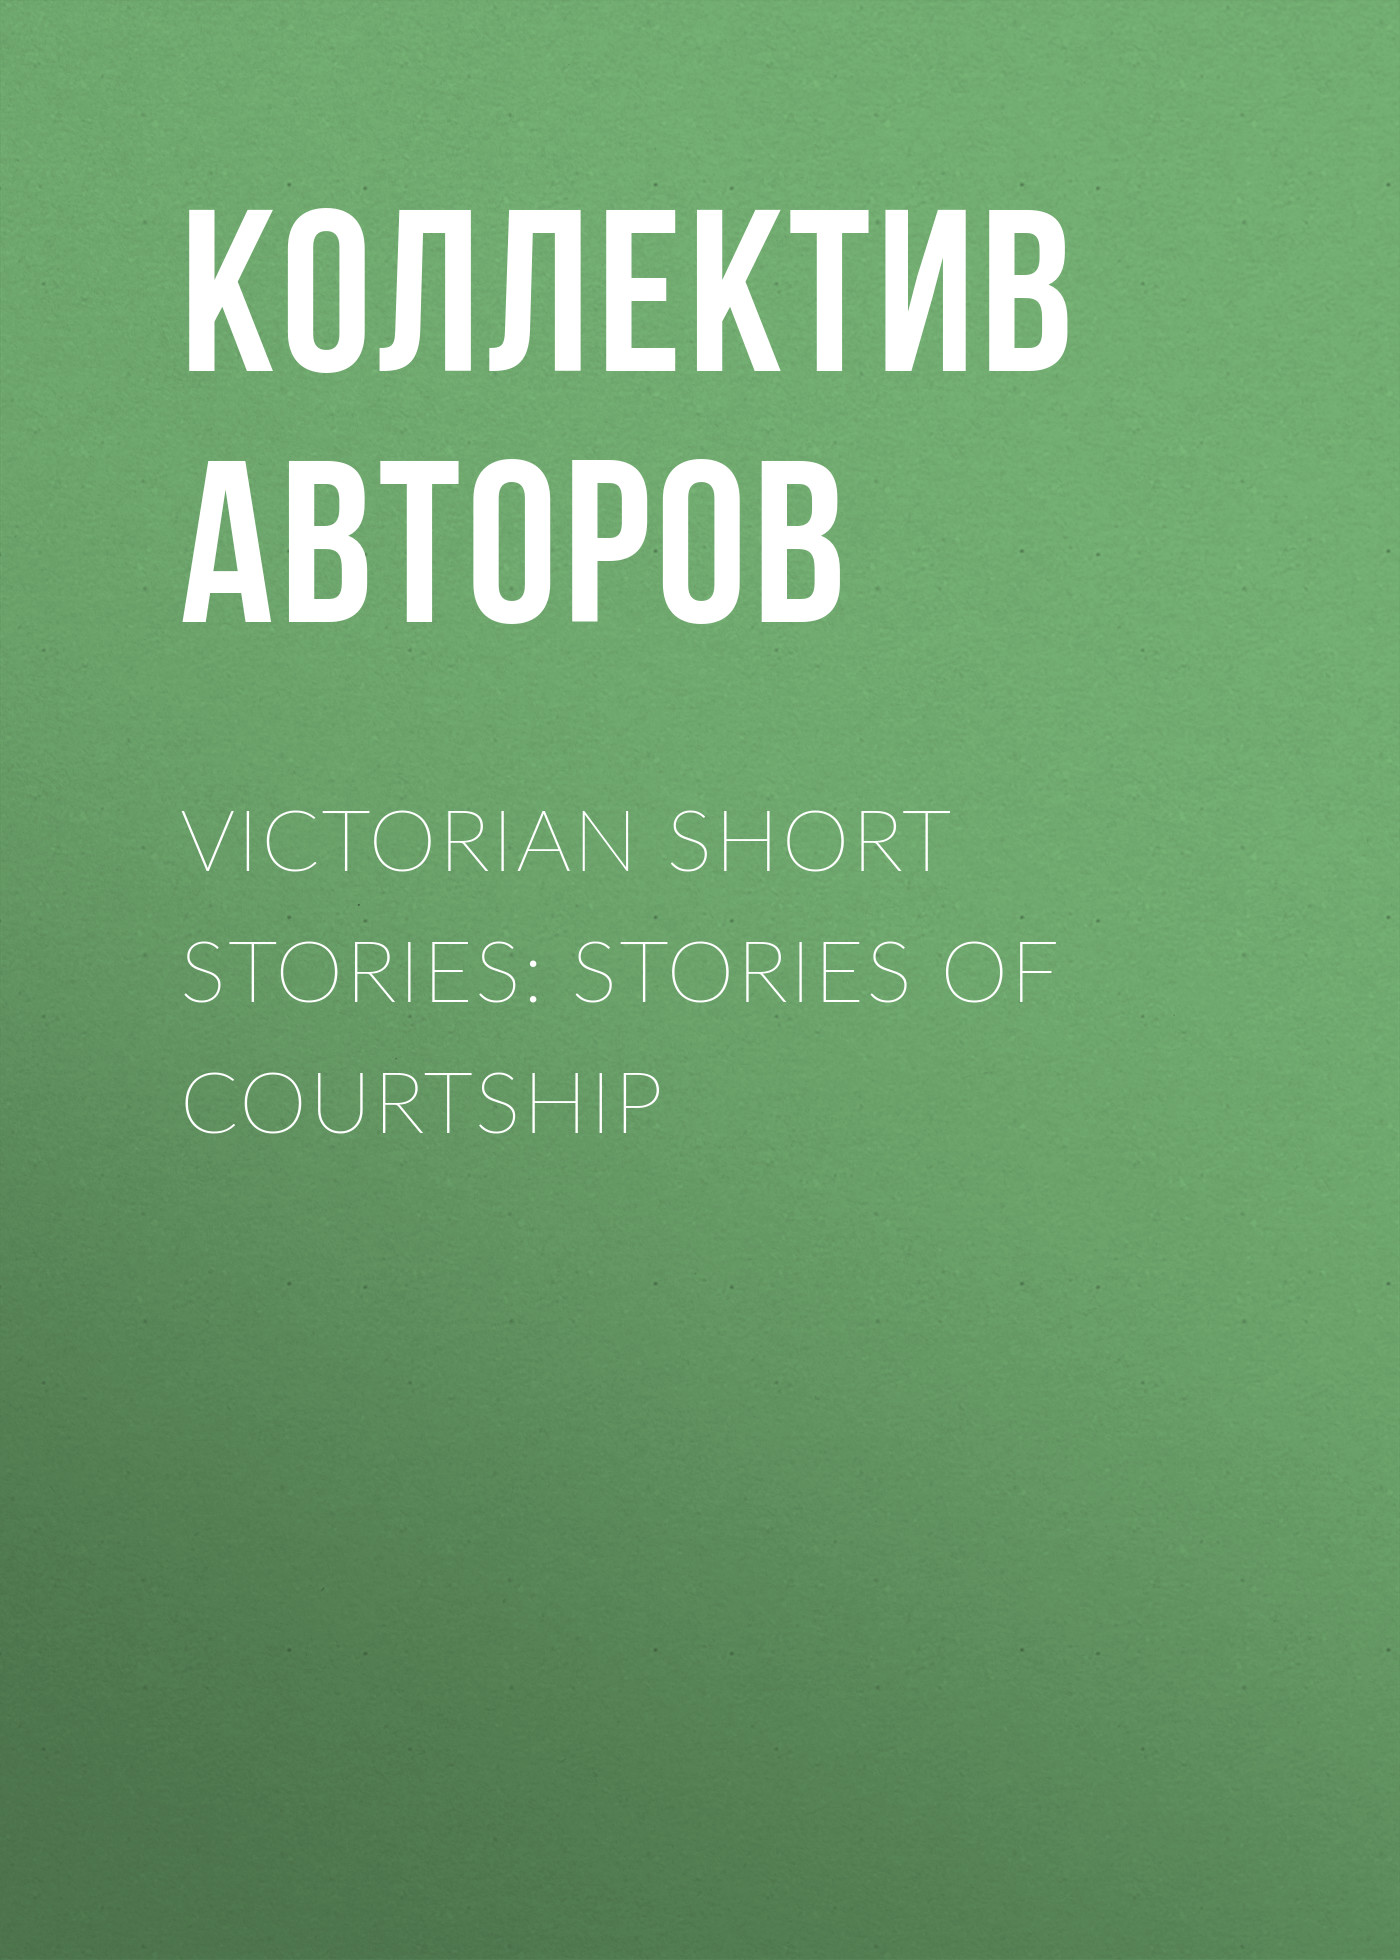 Коллектив авторов Victorian Short Stories: Stories of Courtship prize stories 1994